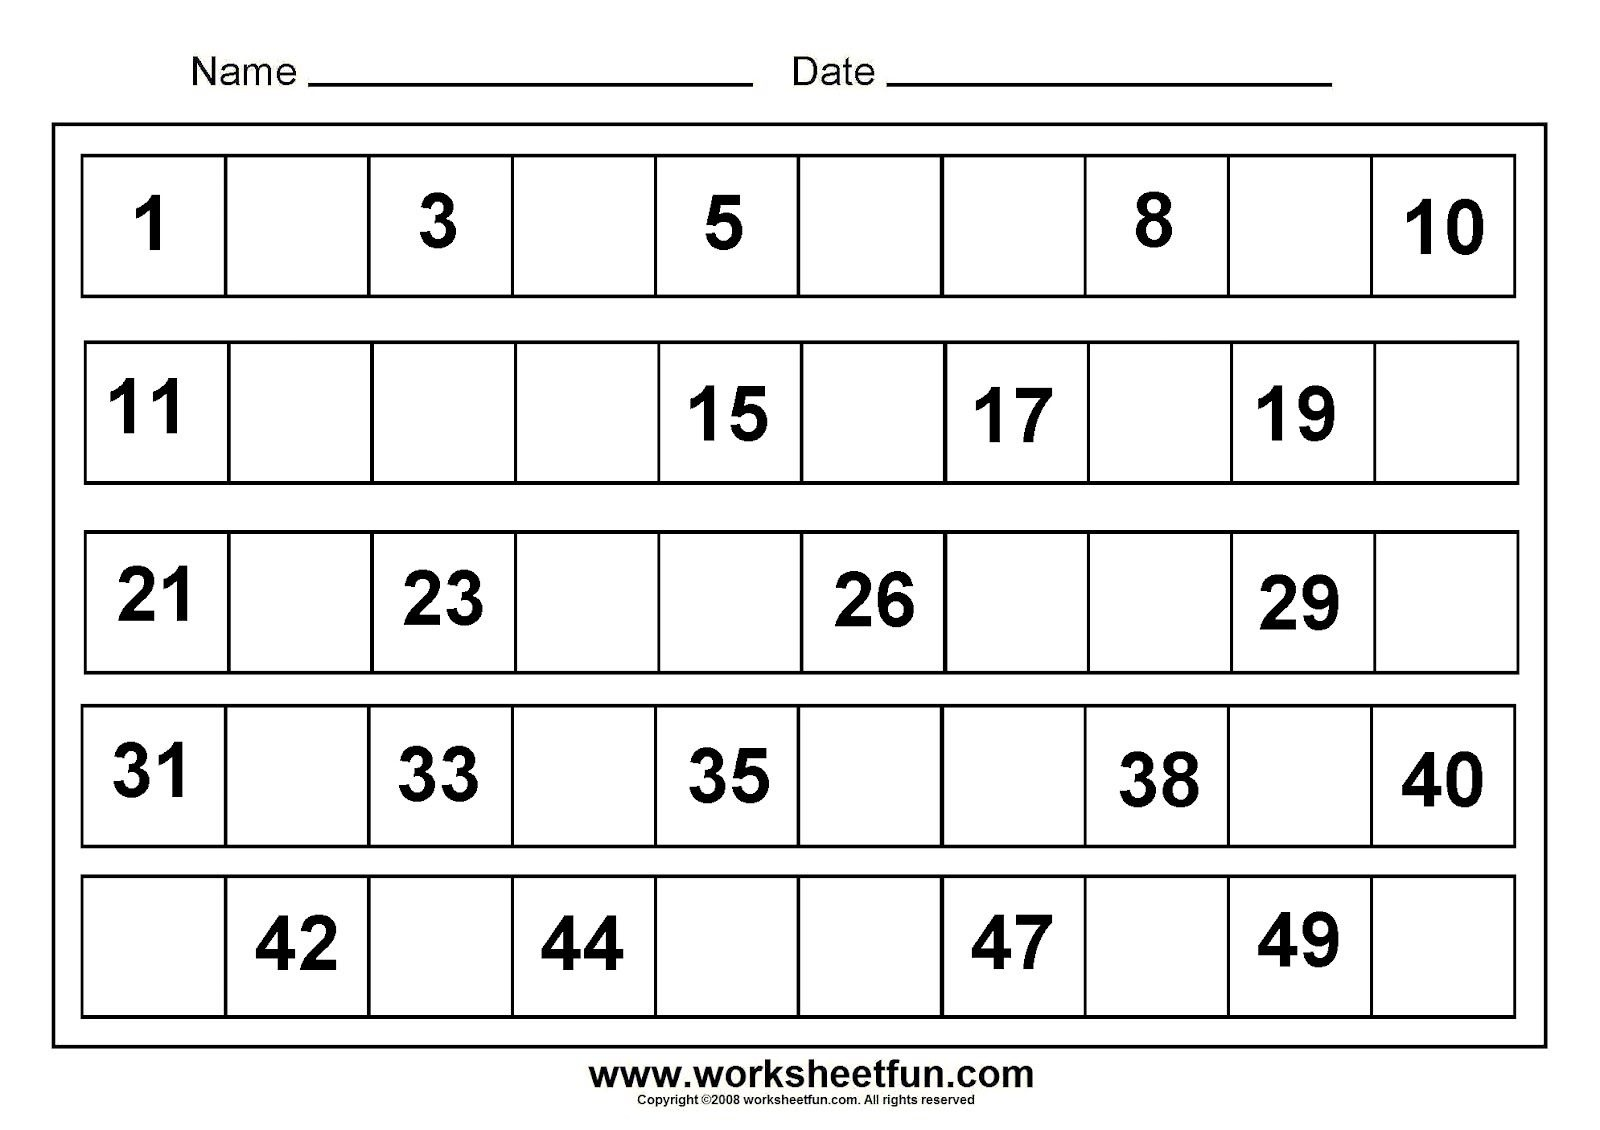 Printables For Kindergarten | Free Printable Math Worksheets For - Free Printable Numbers 1 50